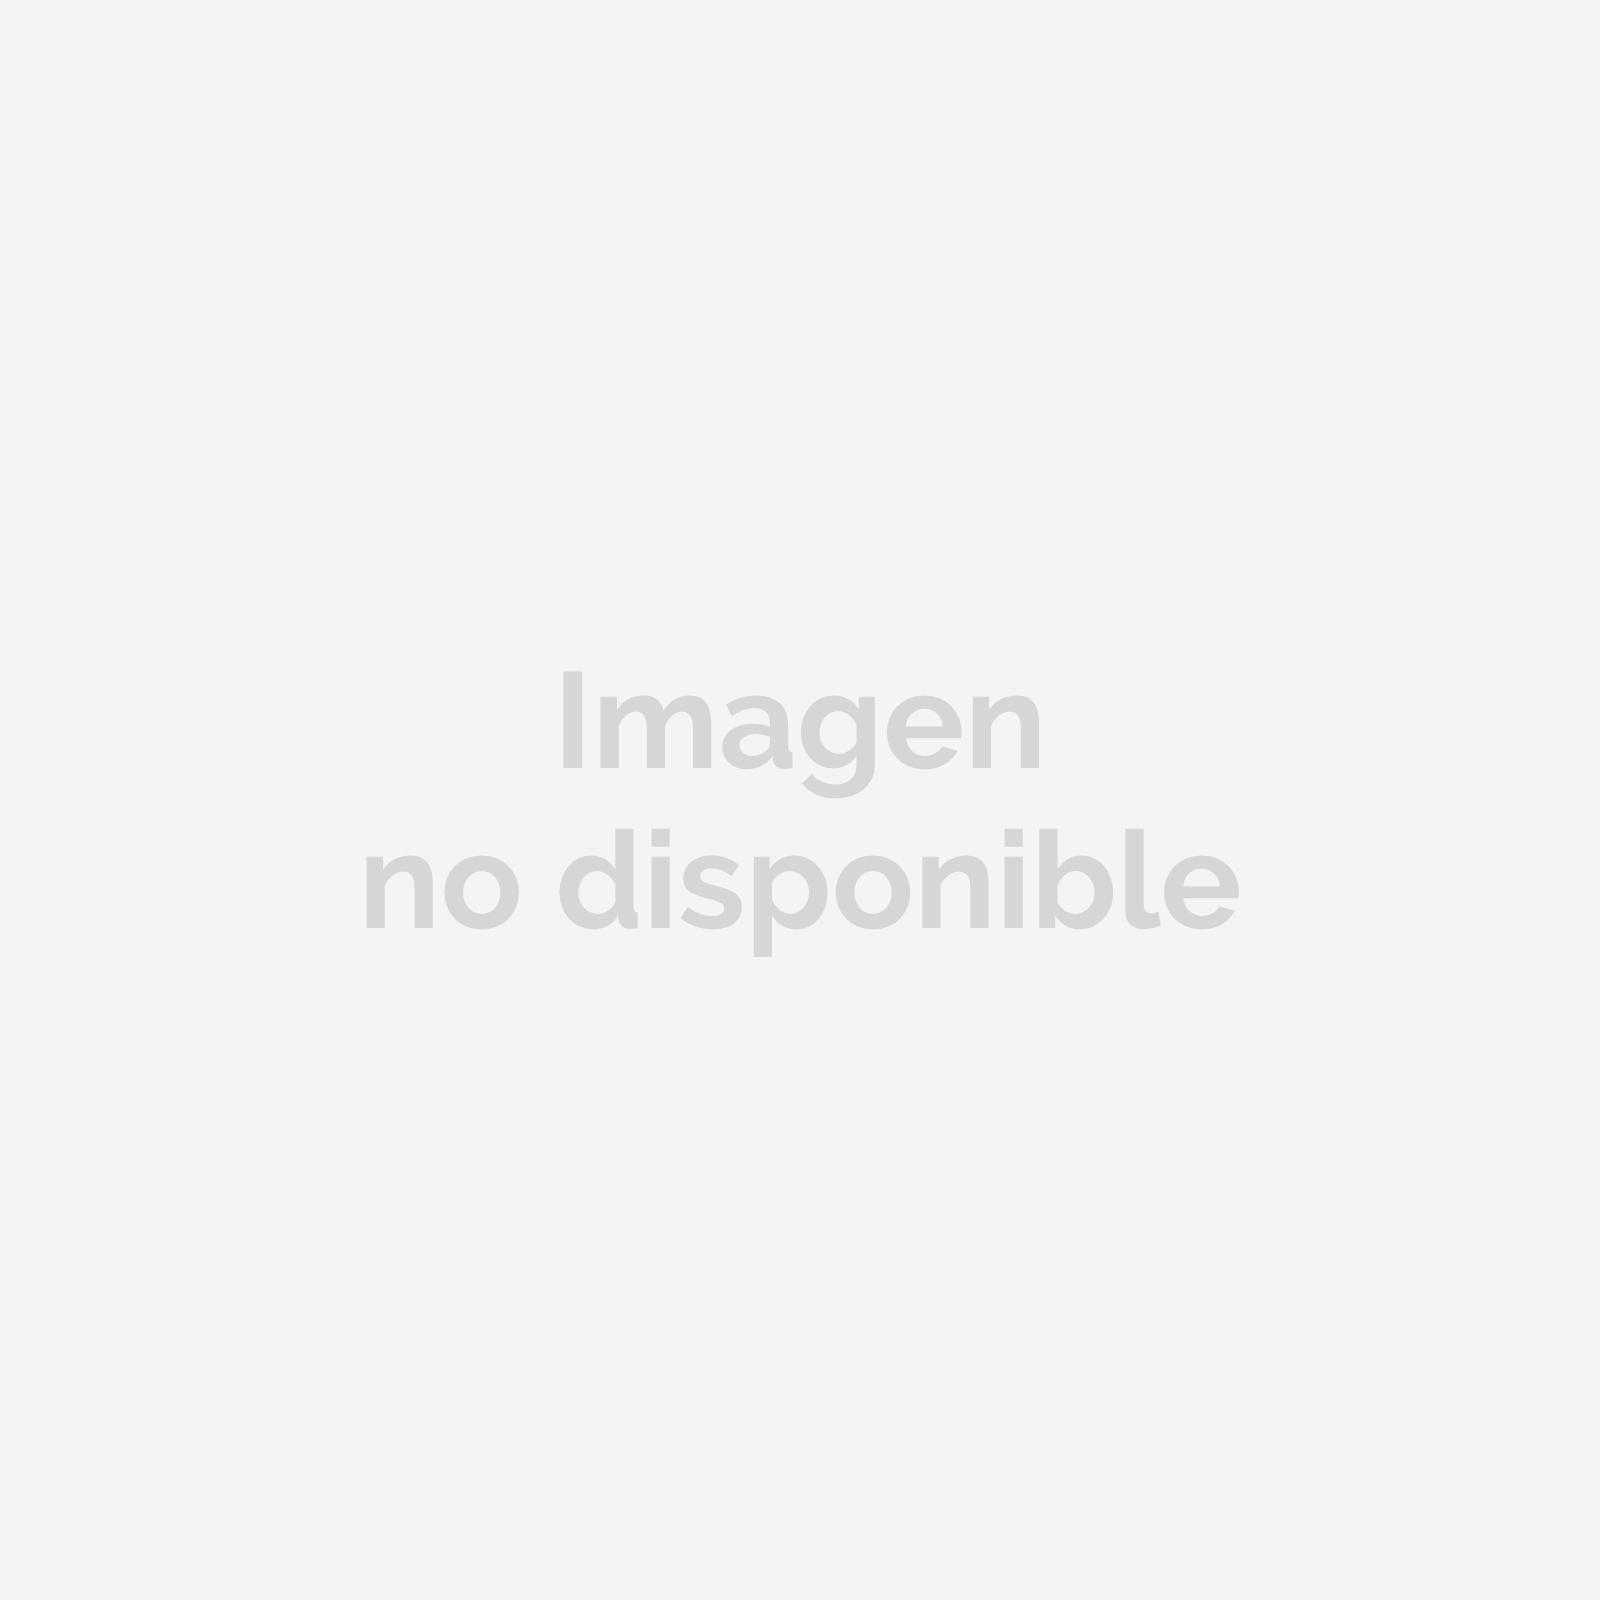 Cepillo Para Limpieza Con Asa Brilliant